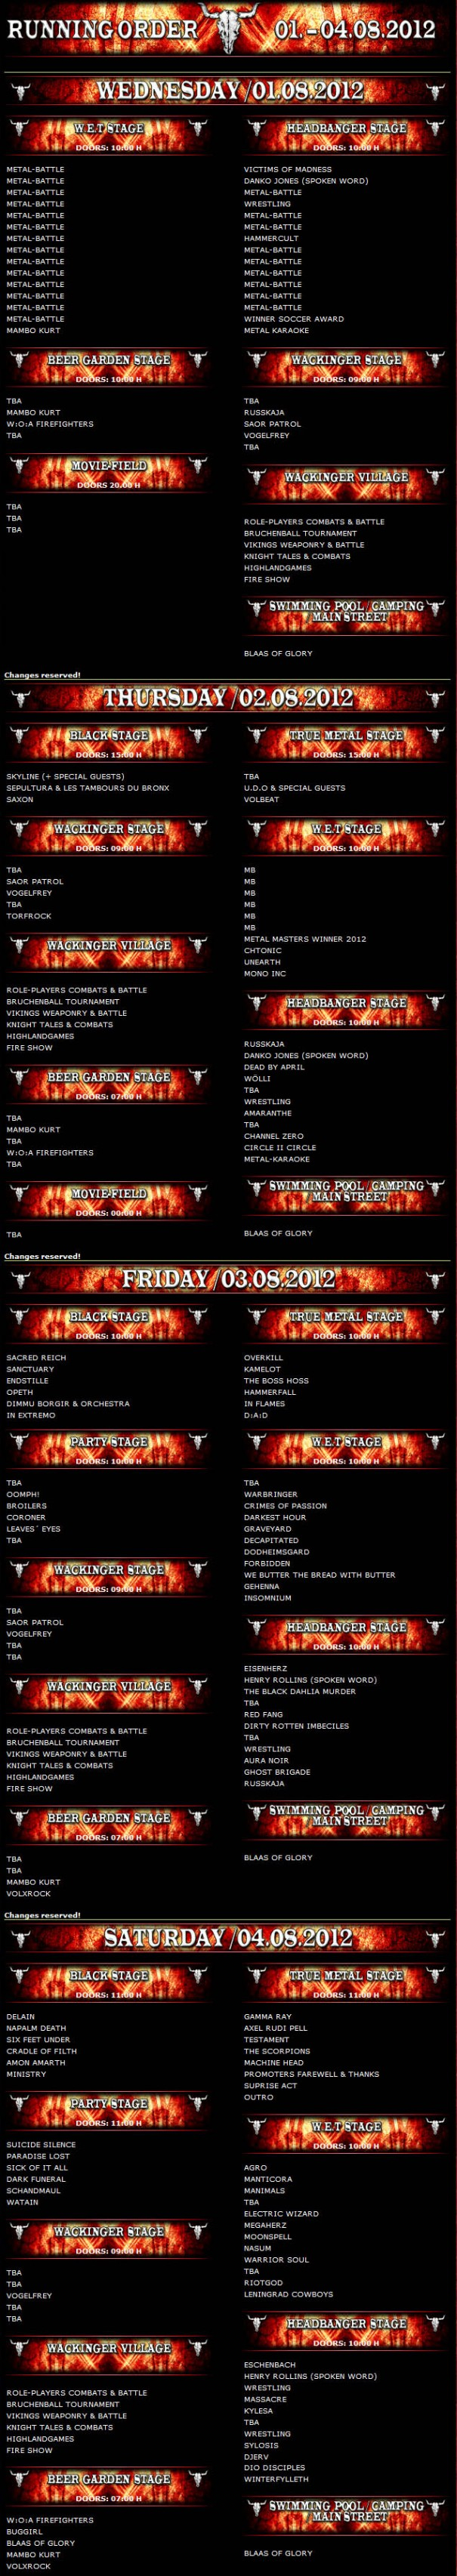 Wacken 2012 Running Order